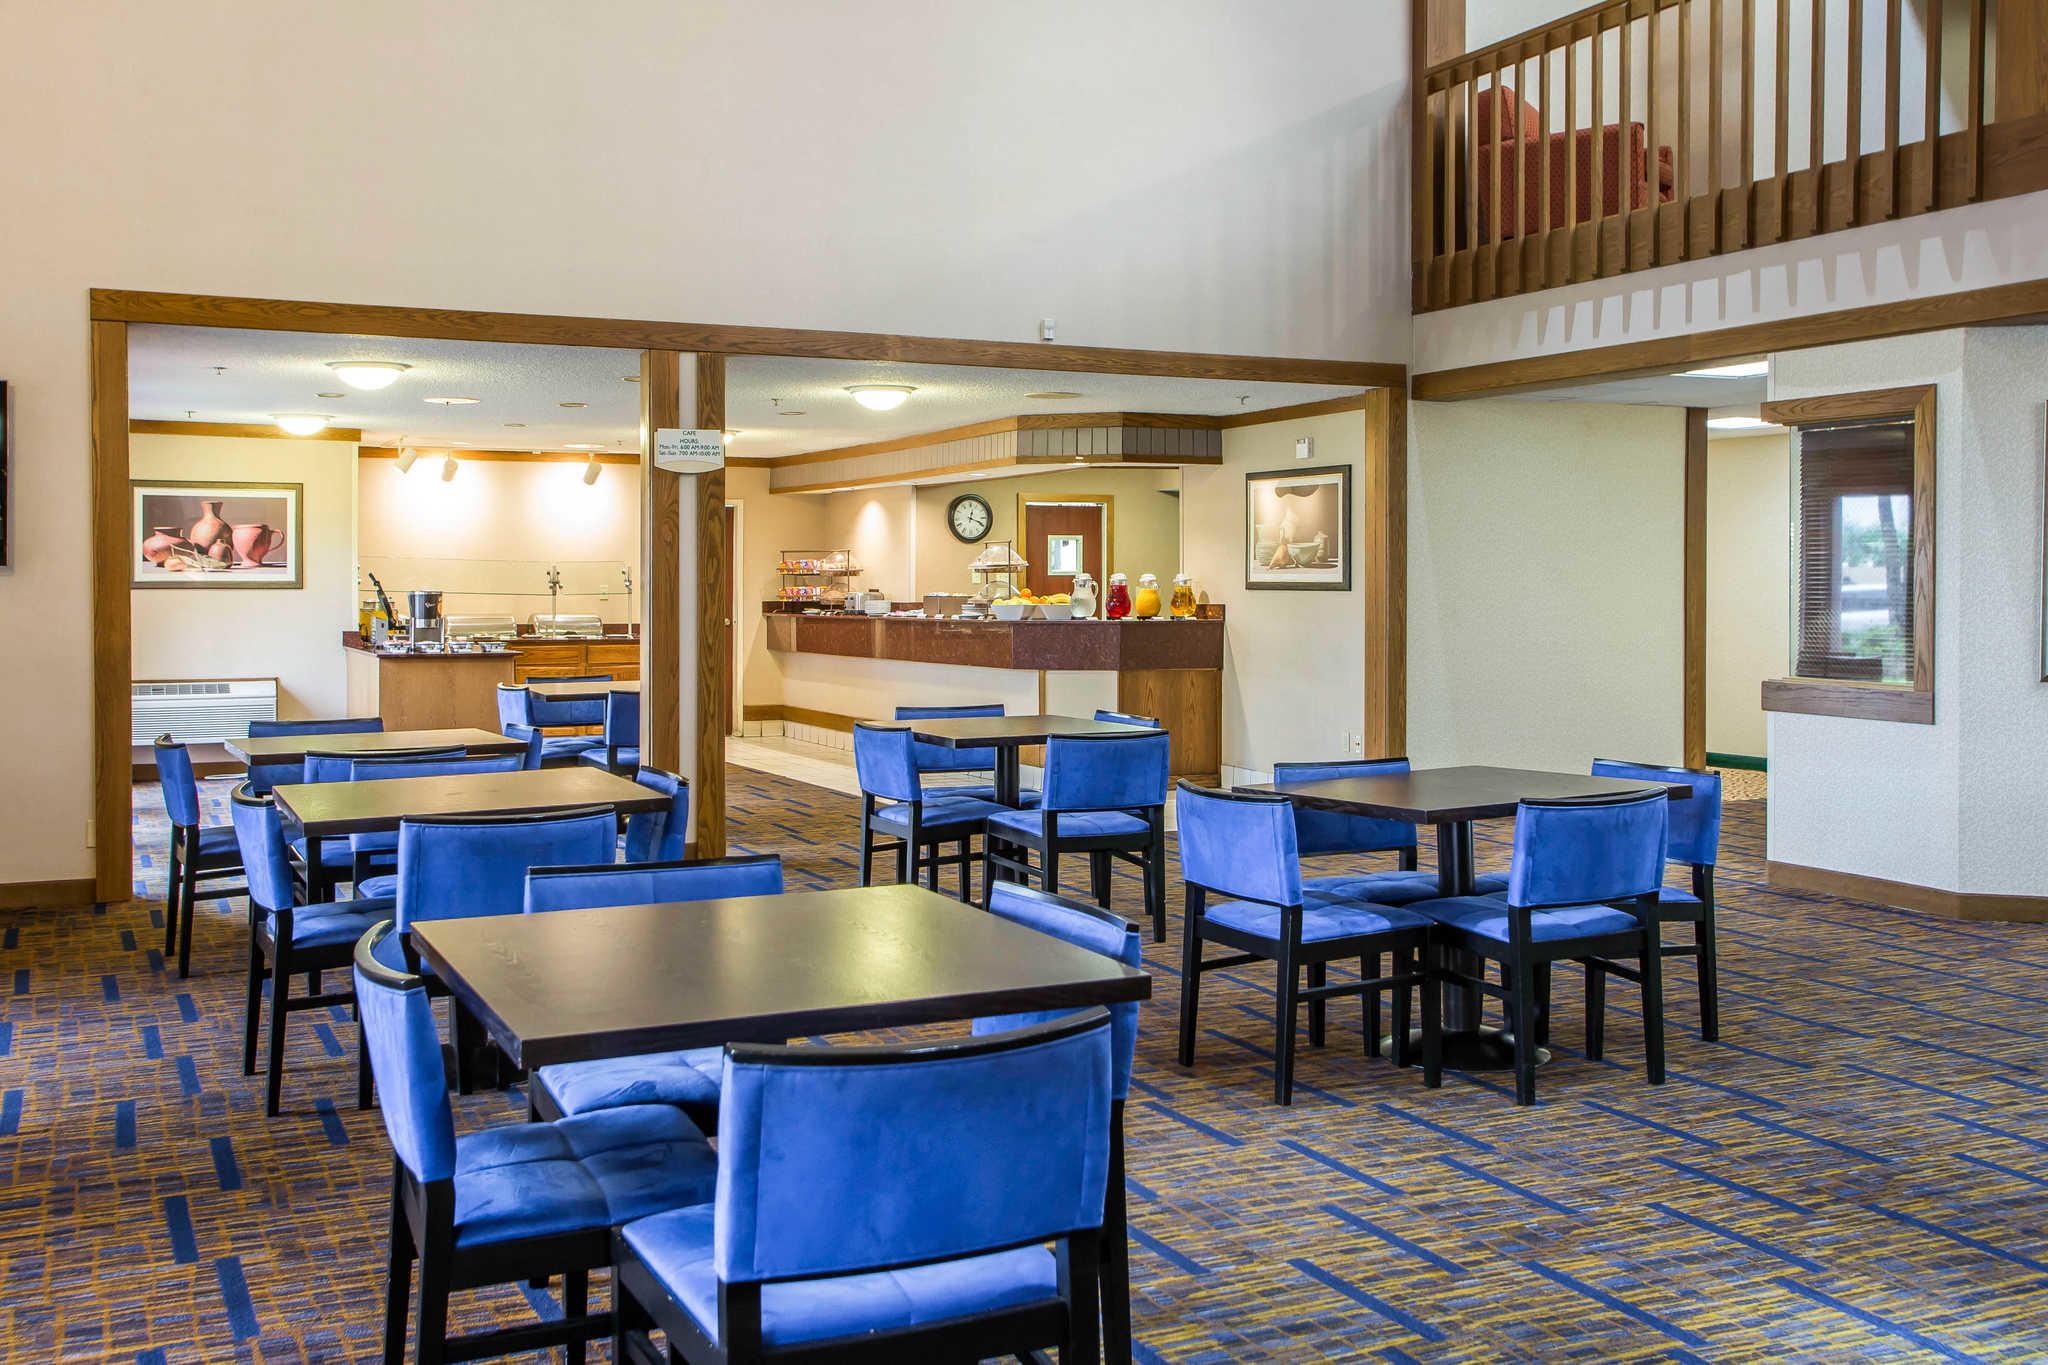 Clarion Inn image 27